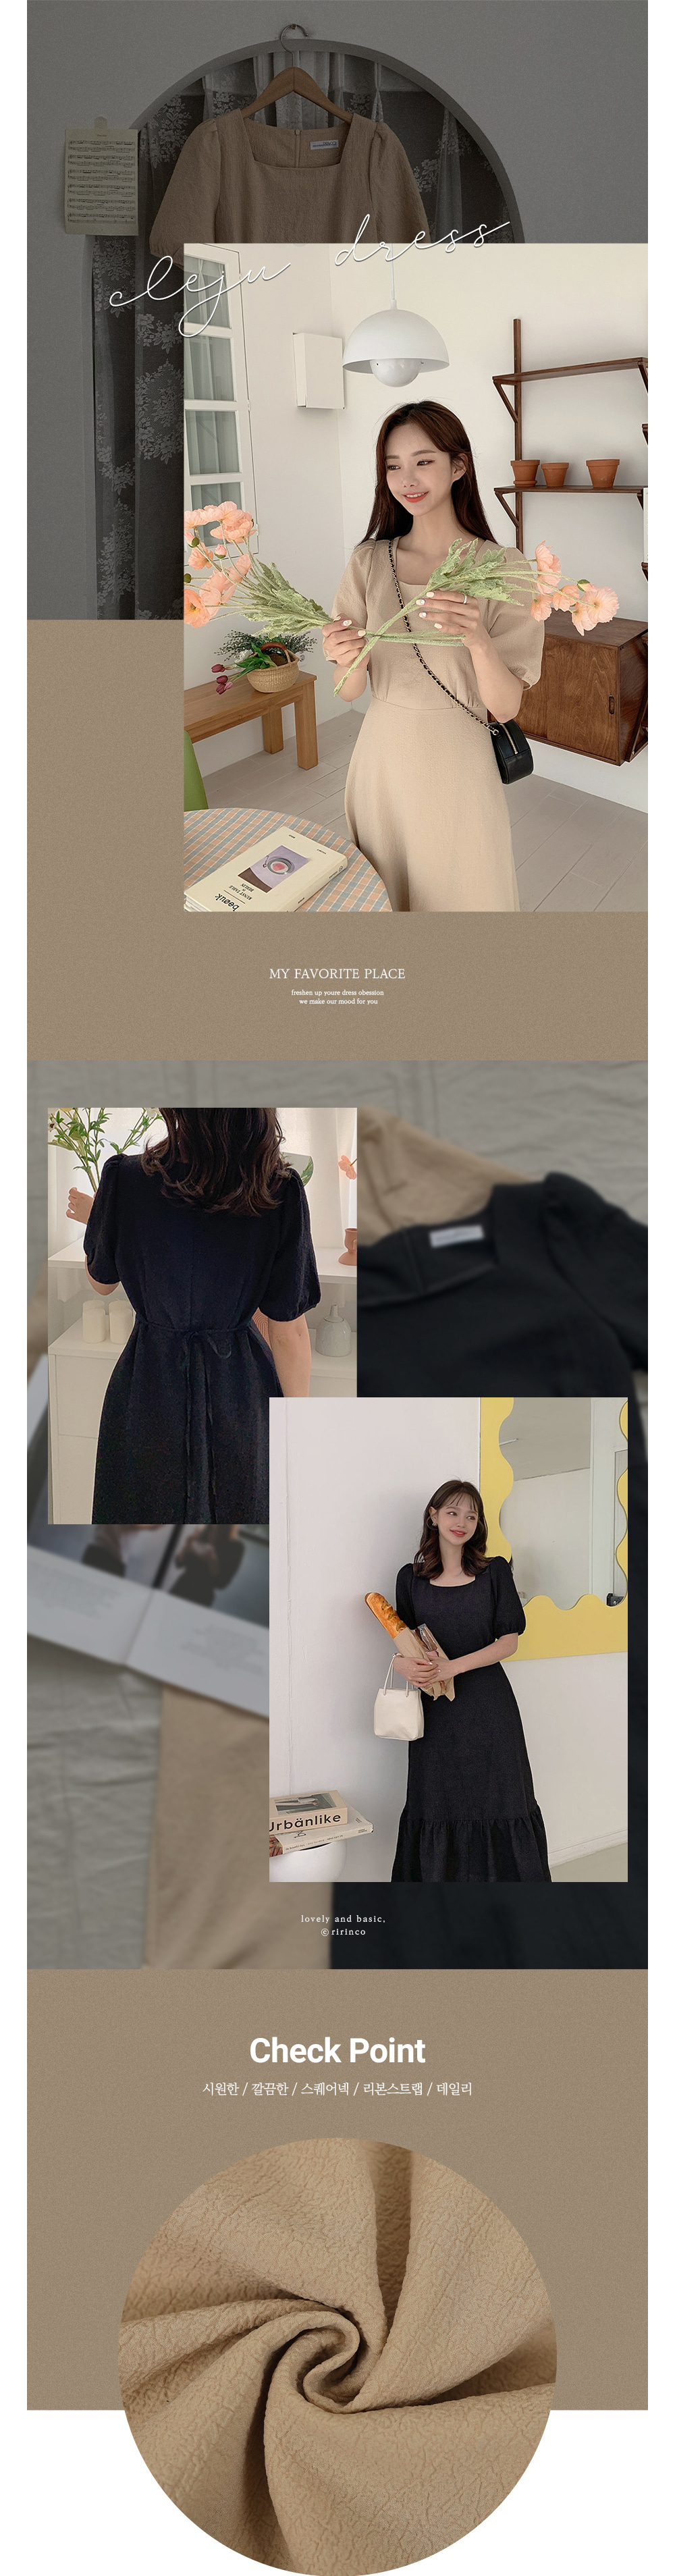 dress detail image-S1L1